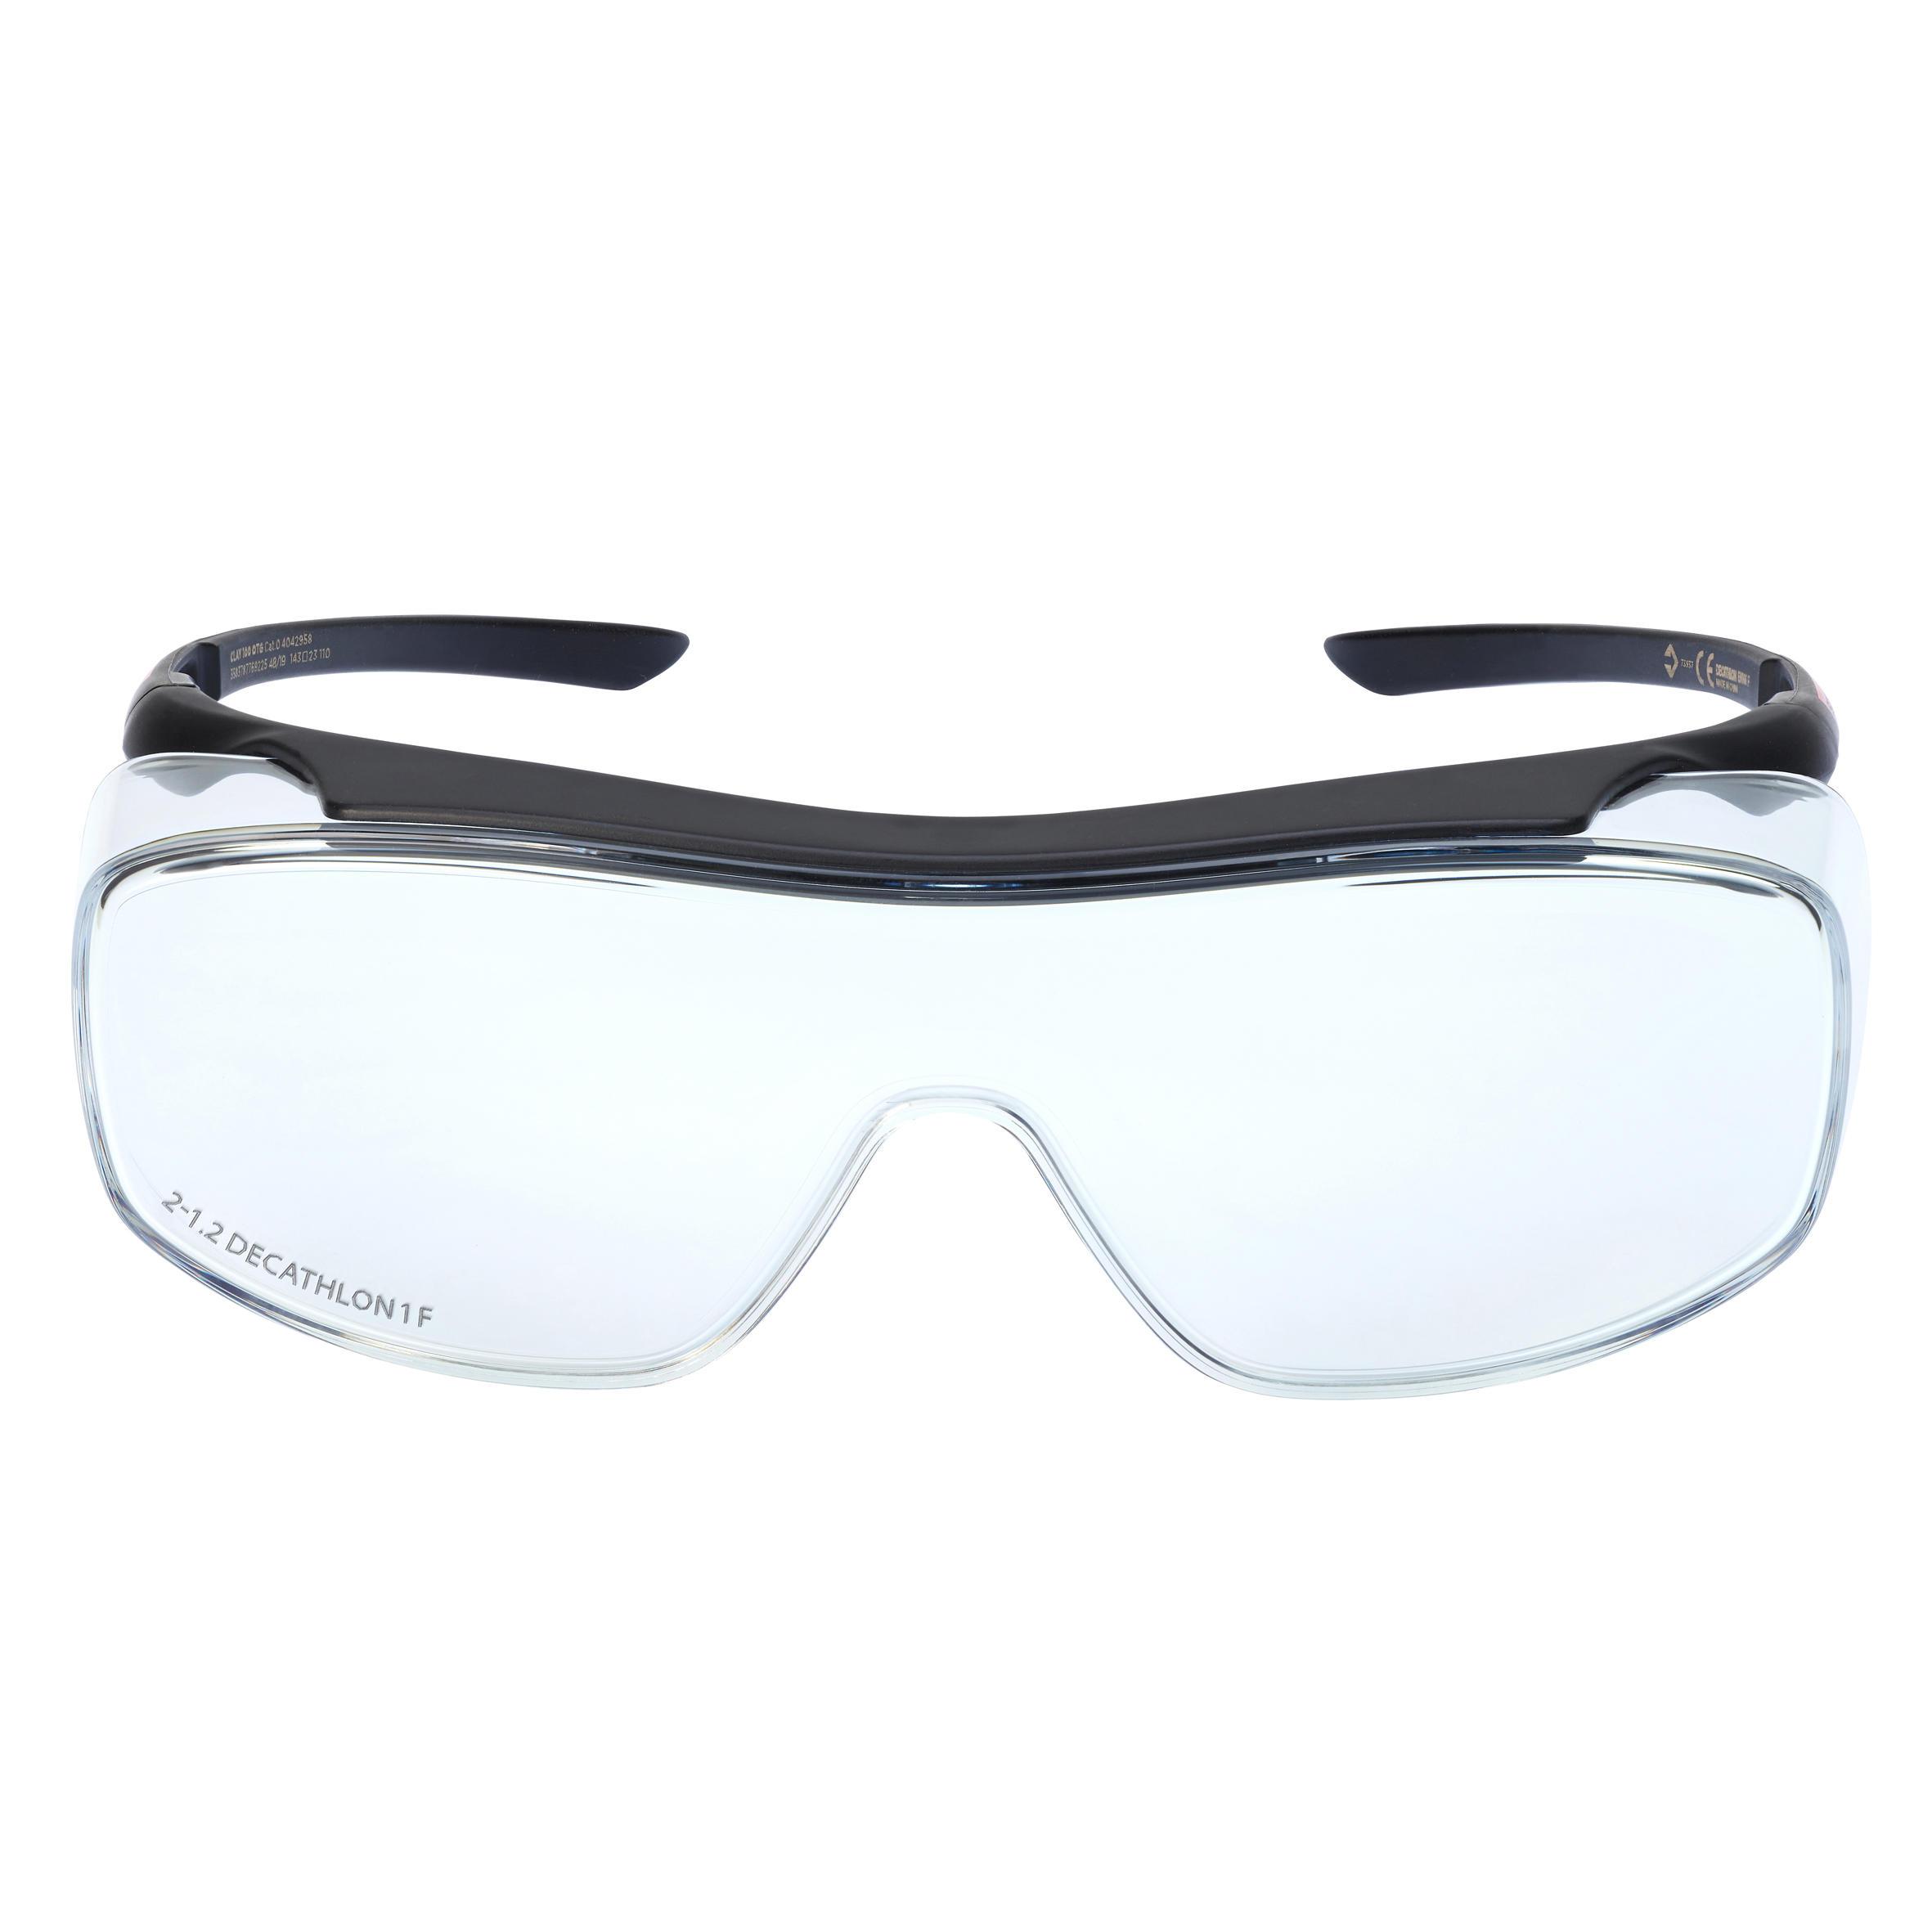 Supra-ochelari CLAY100 OTG imagine